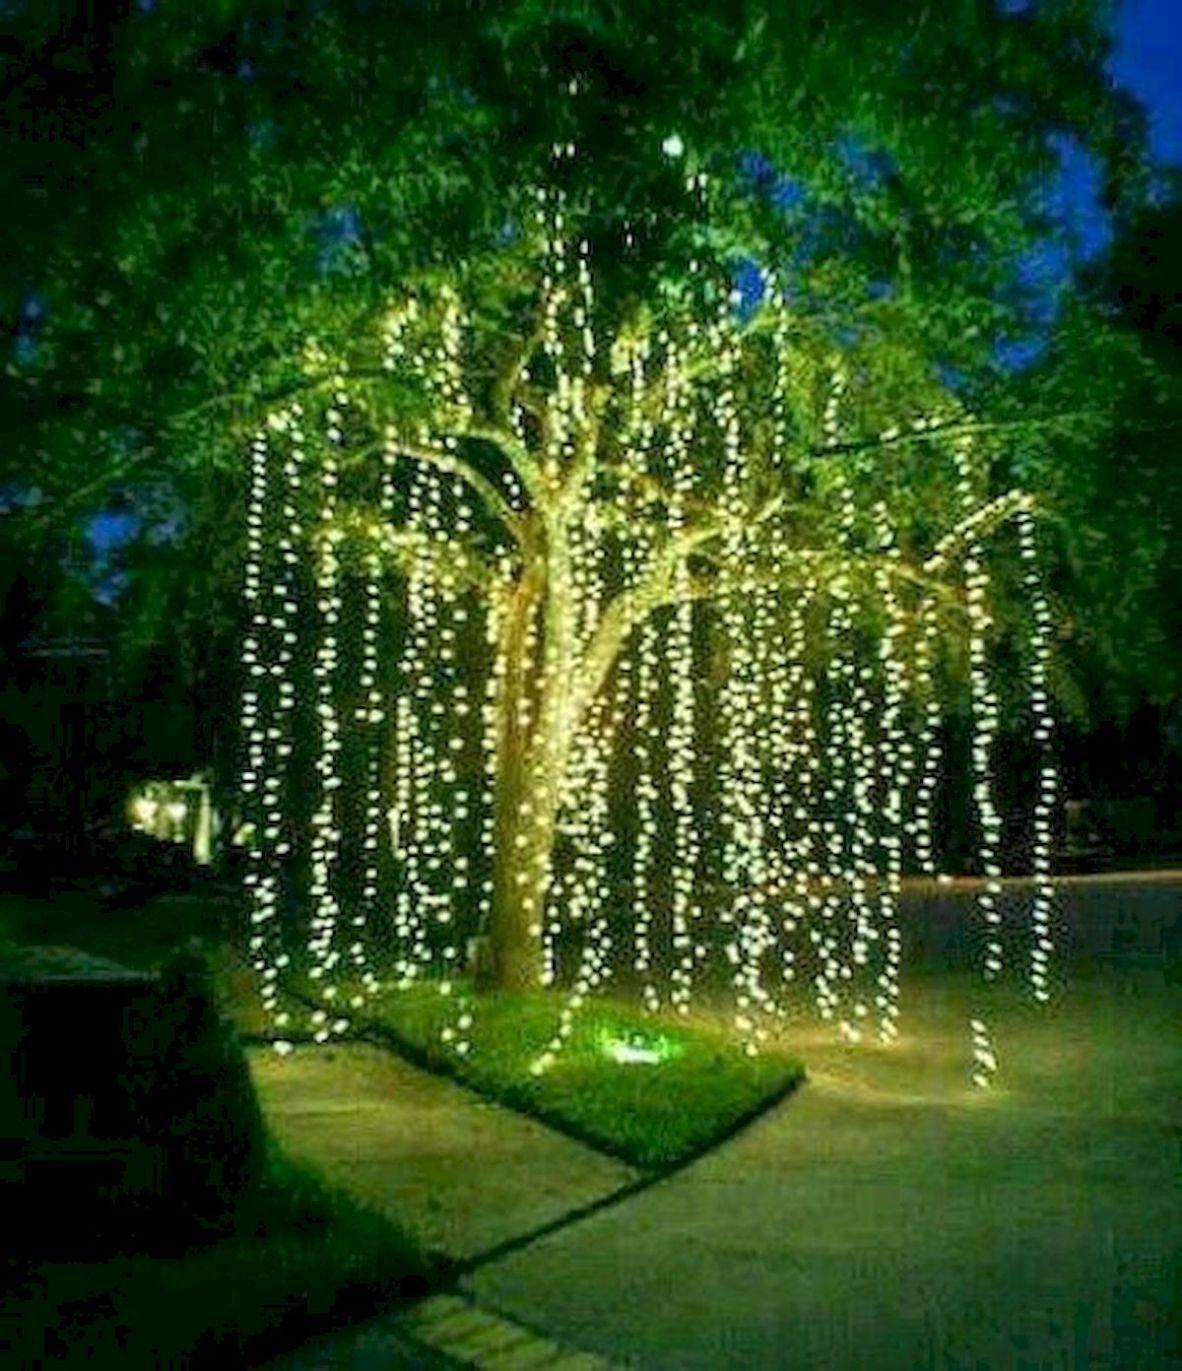 Outdoor Christmas Lights Decorations Ideas 46 Christmas Lights